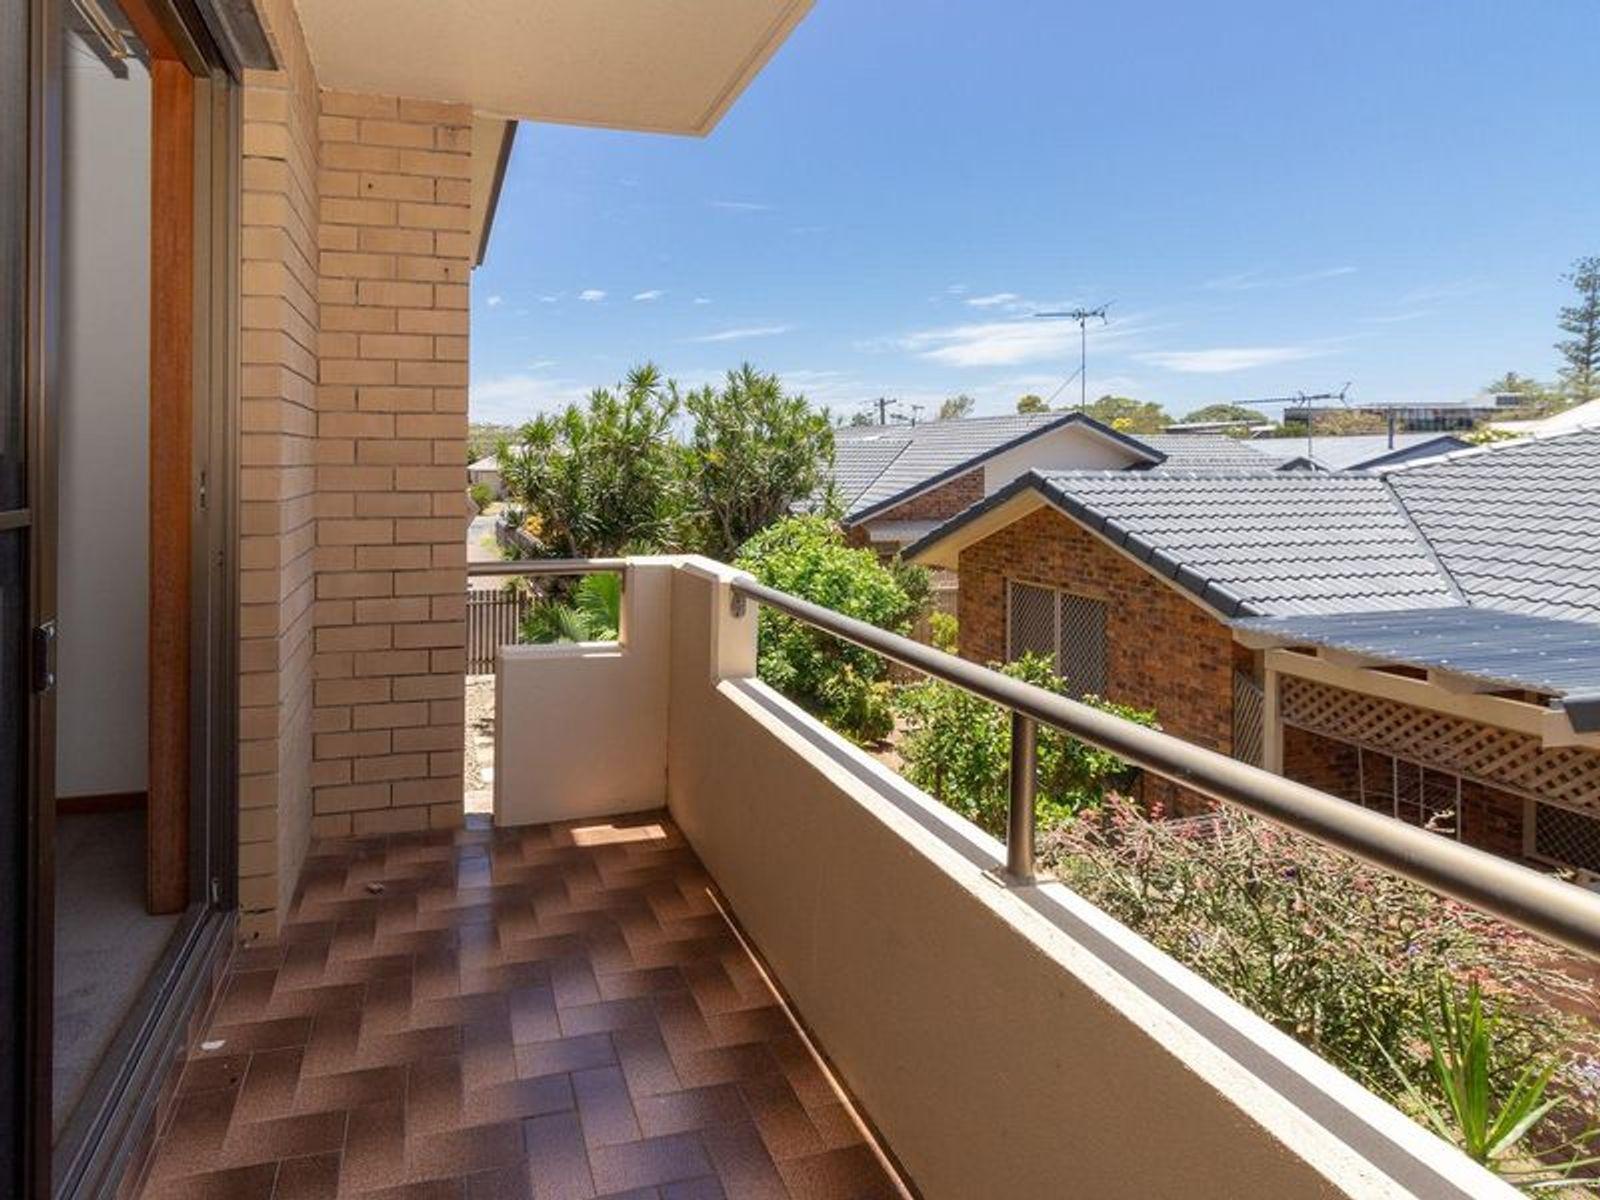 7/60 Swift Street, Ballina, NSW 2478